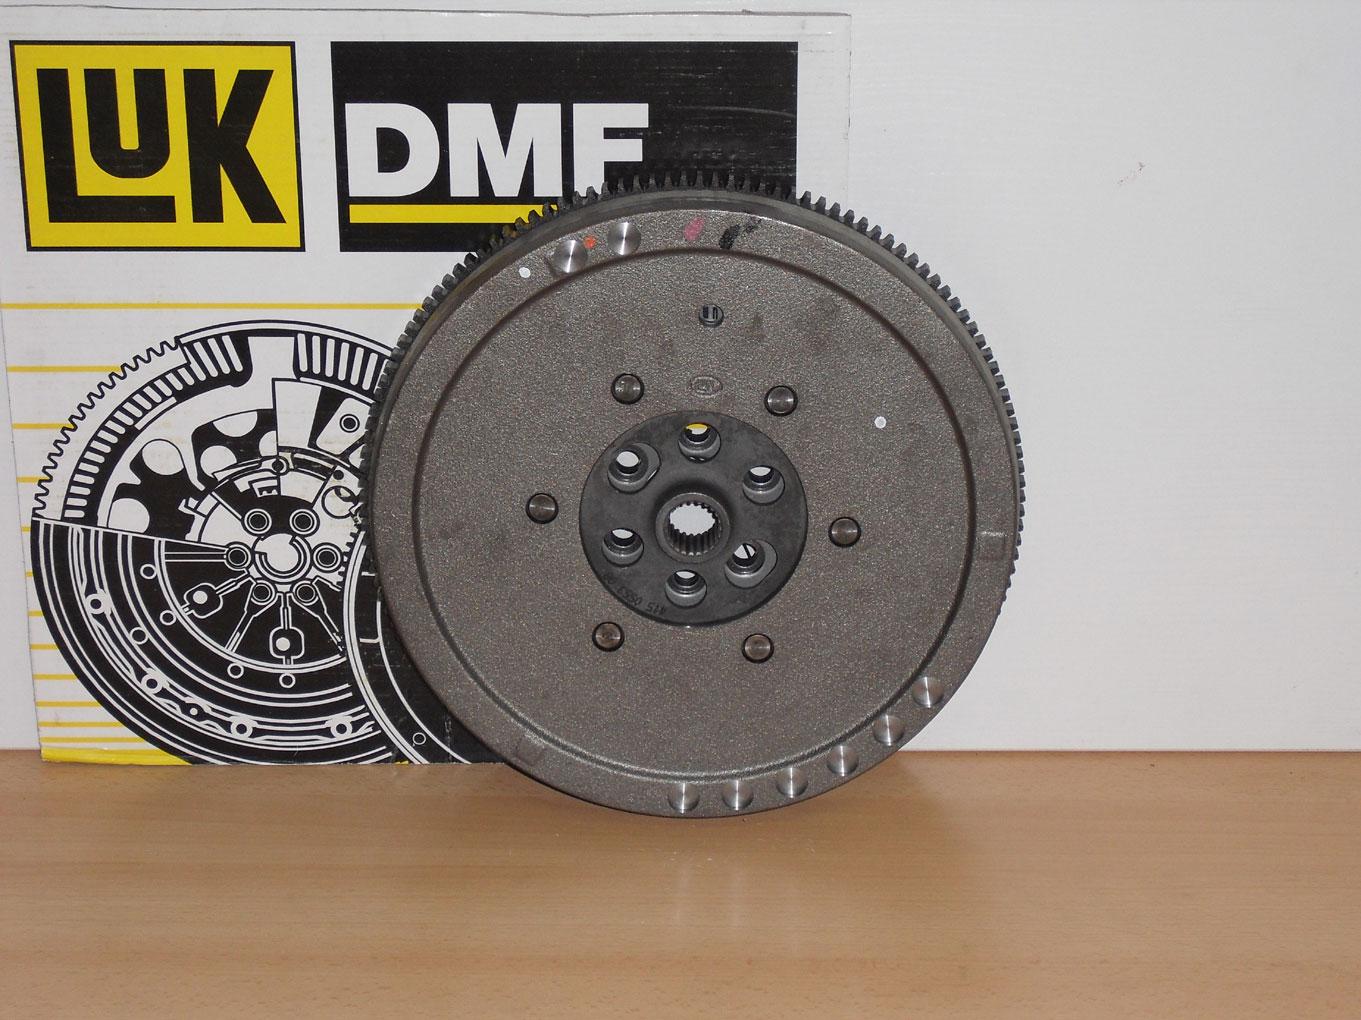 LUK Flywheel Bolt Screw Set For Alfa Romeo Fiat Vauxhall Opel Dual Mass